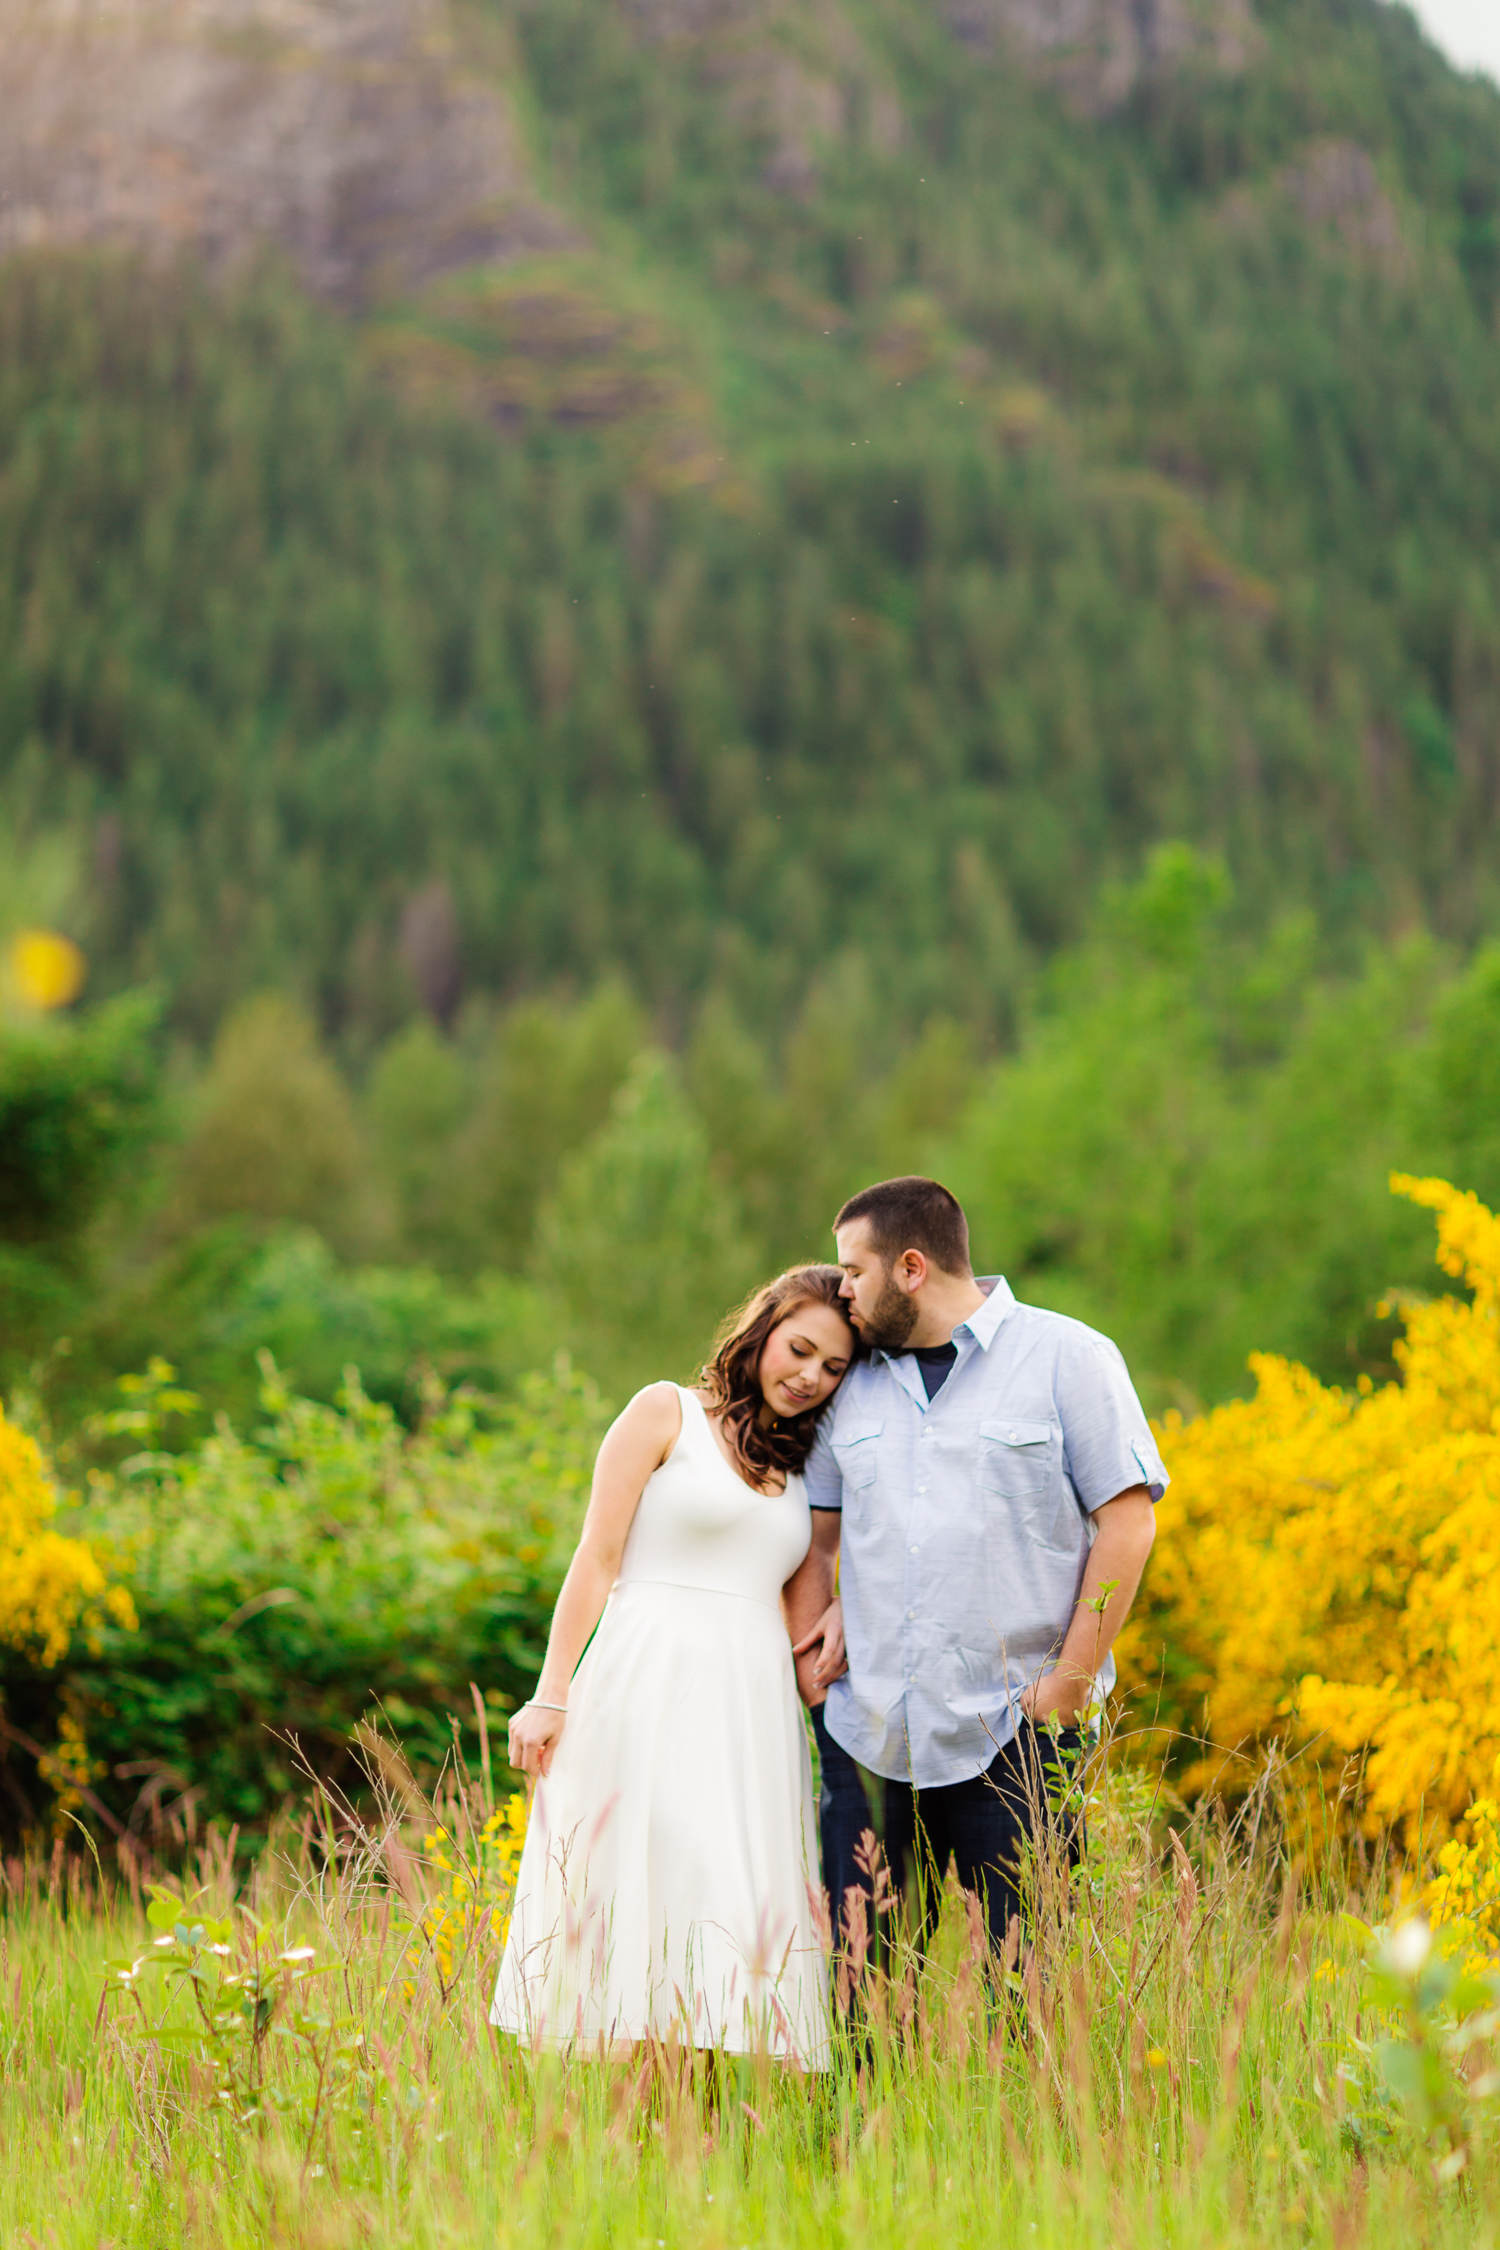 ariellanoellephotography-engagement-photographer-seattle-area-monroe-duvall-kirkland-redmond-photography-1-13.jpg